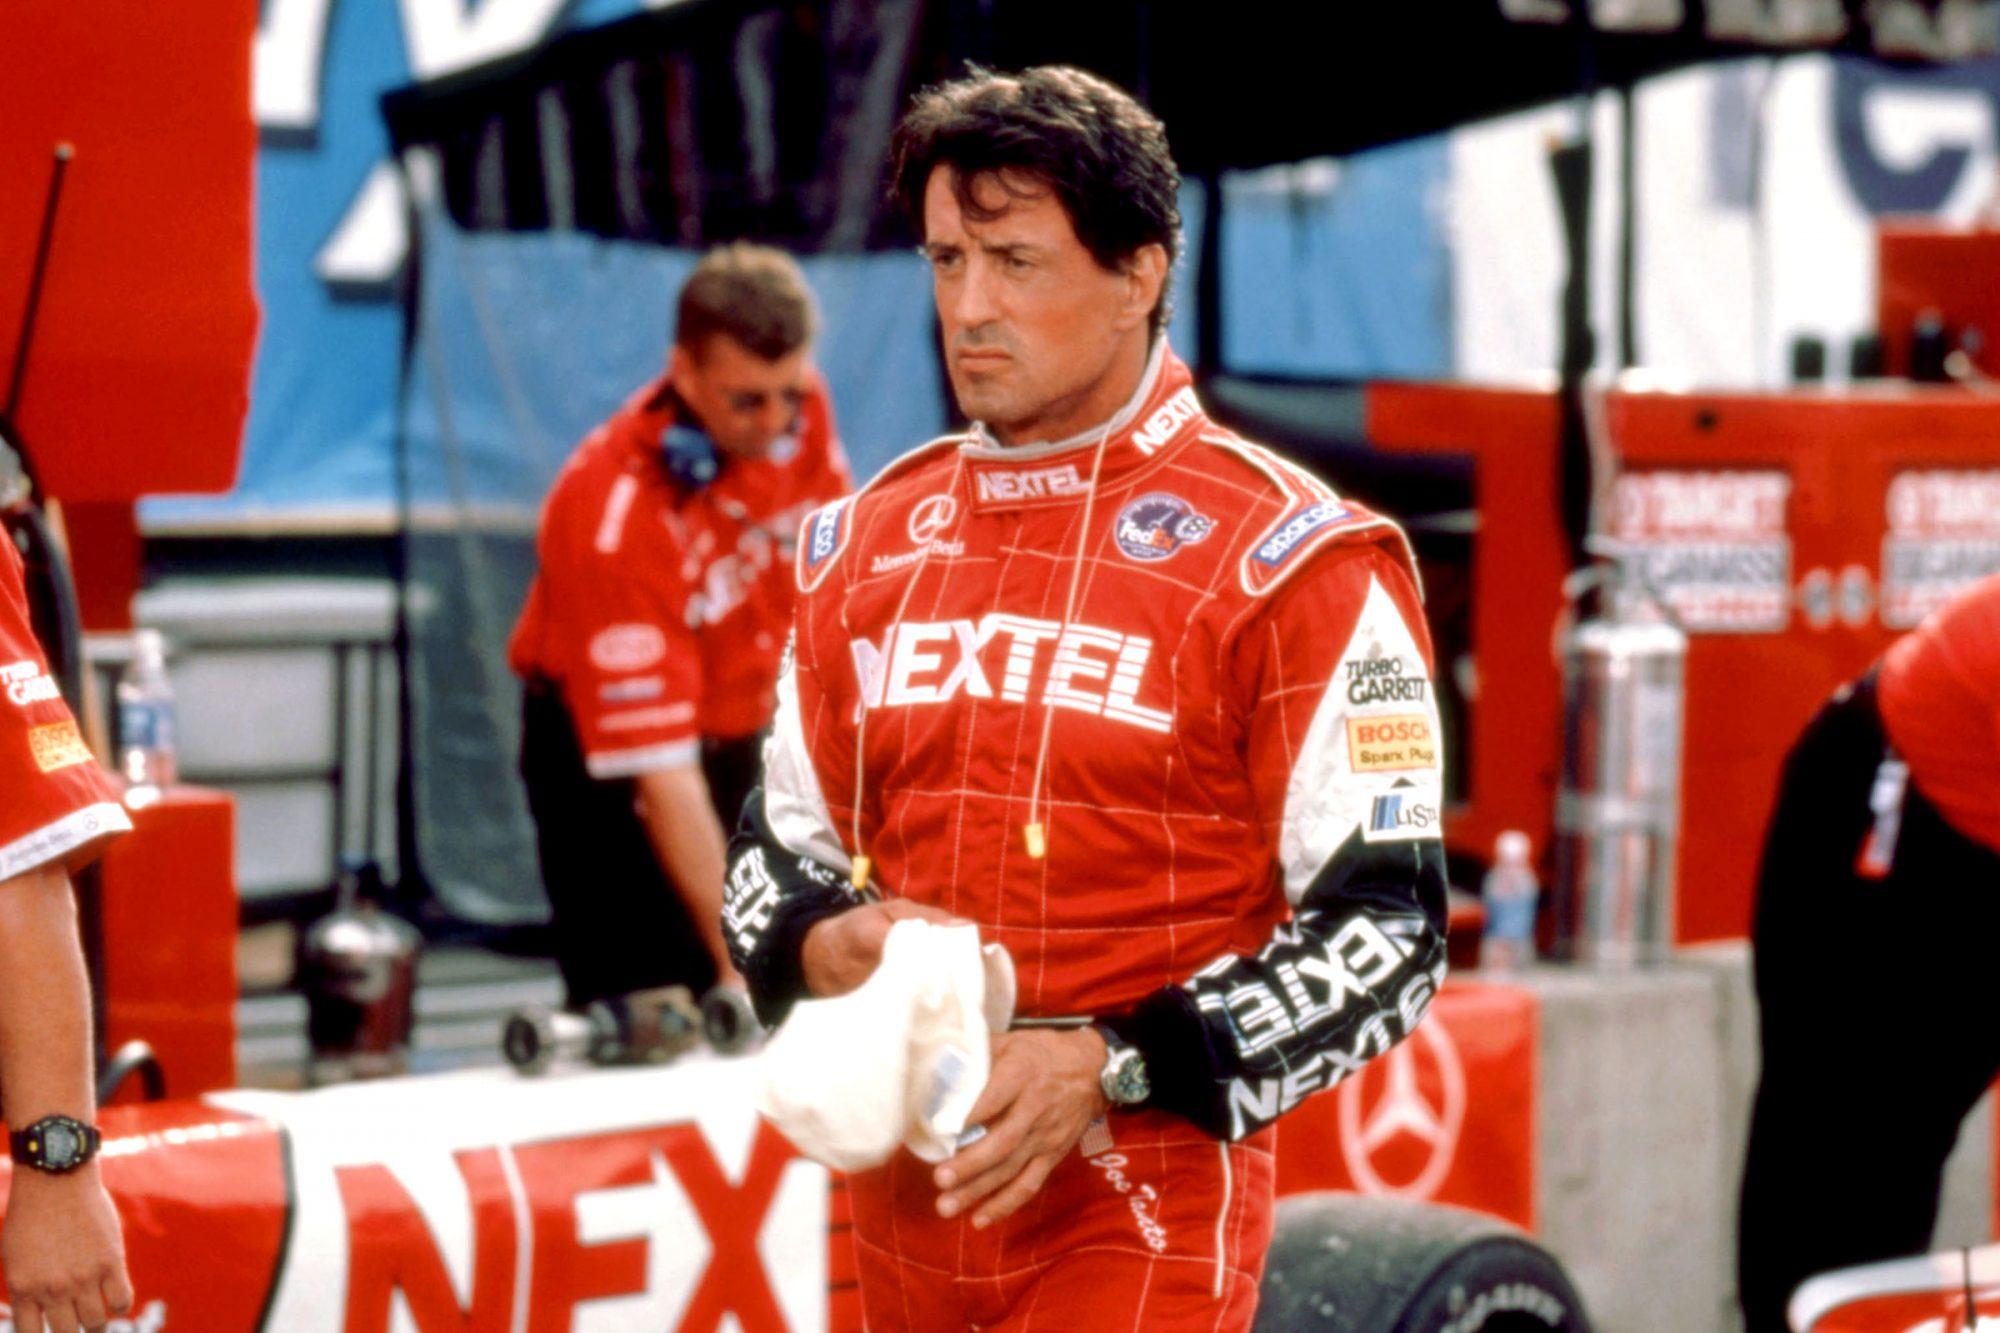 DRIVEN, Sylvester Stallone, 2001, (c)Warner Bros./courtesy Everett Collection